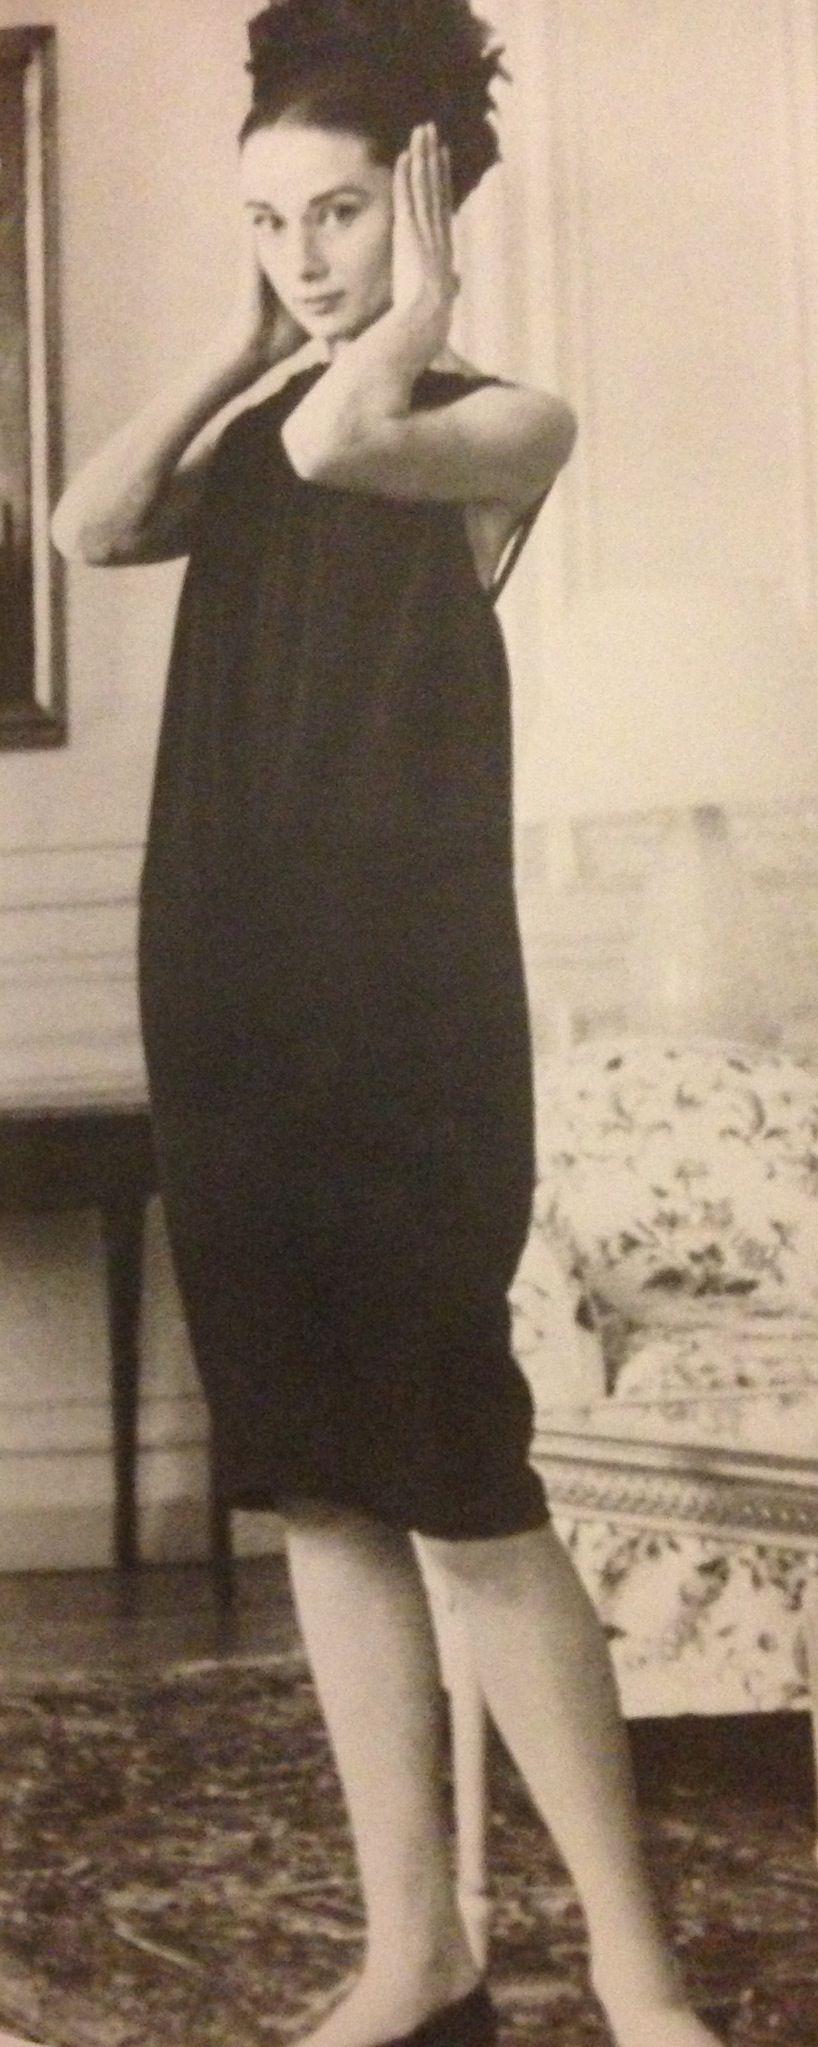 1950s Chemise Or Quot Sack Quot Dress